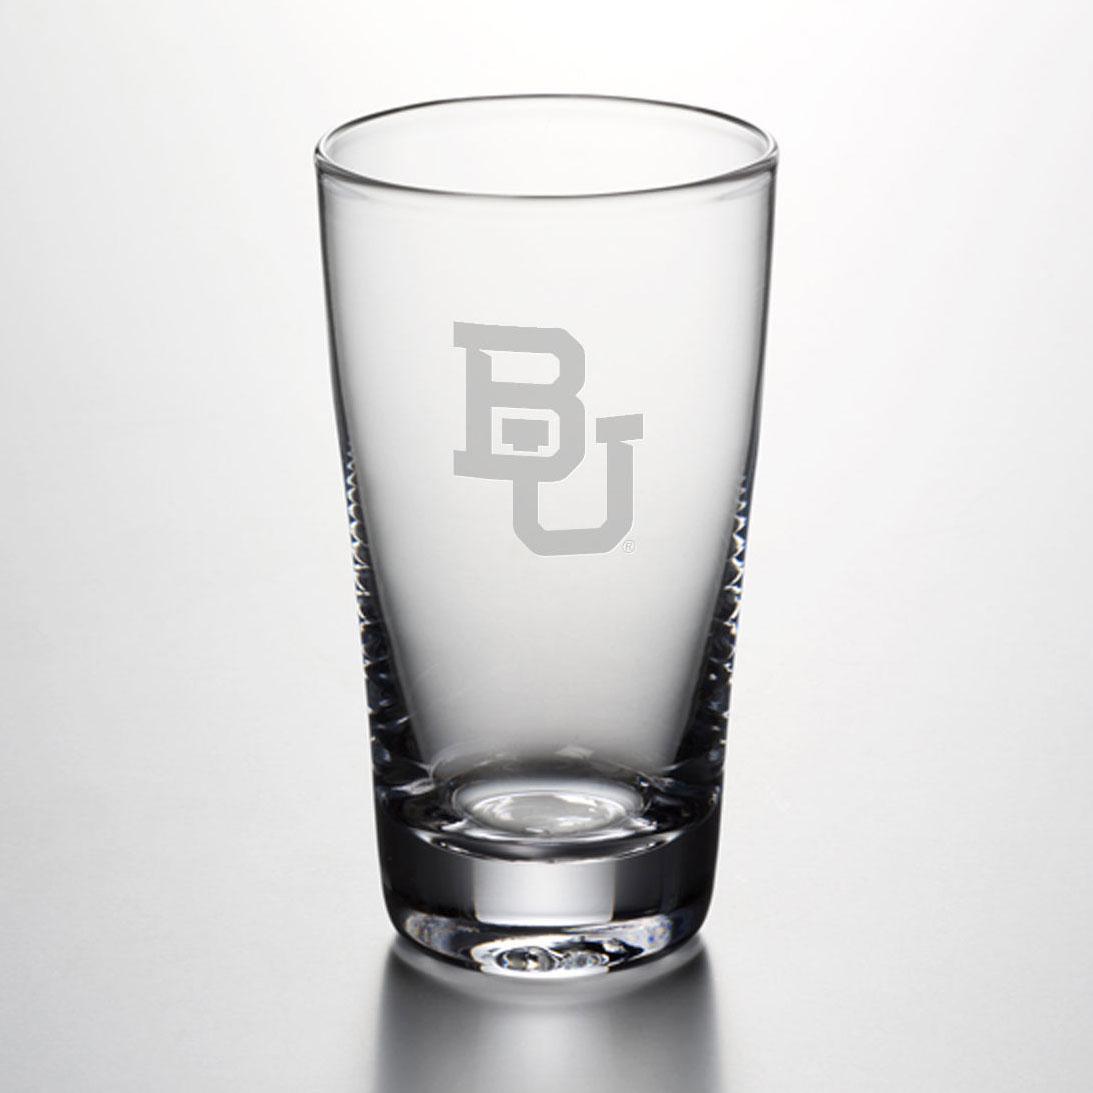 Baylor Ascutney Pint Glass by Simon Pearce